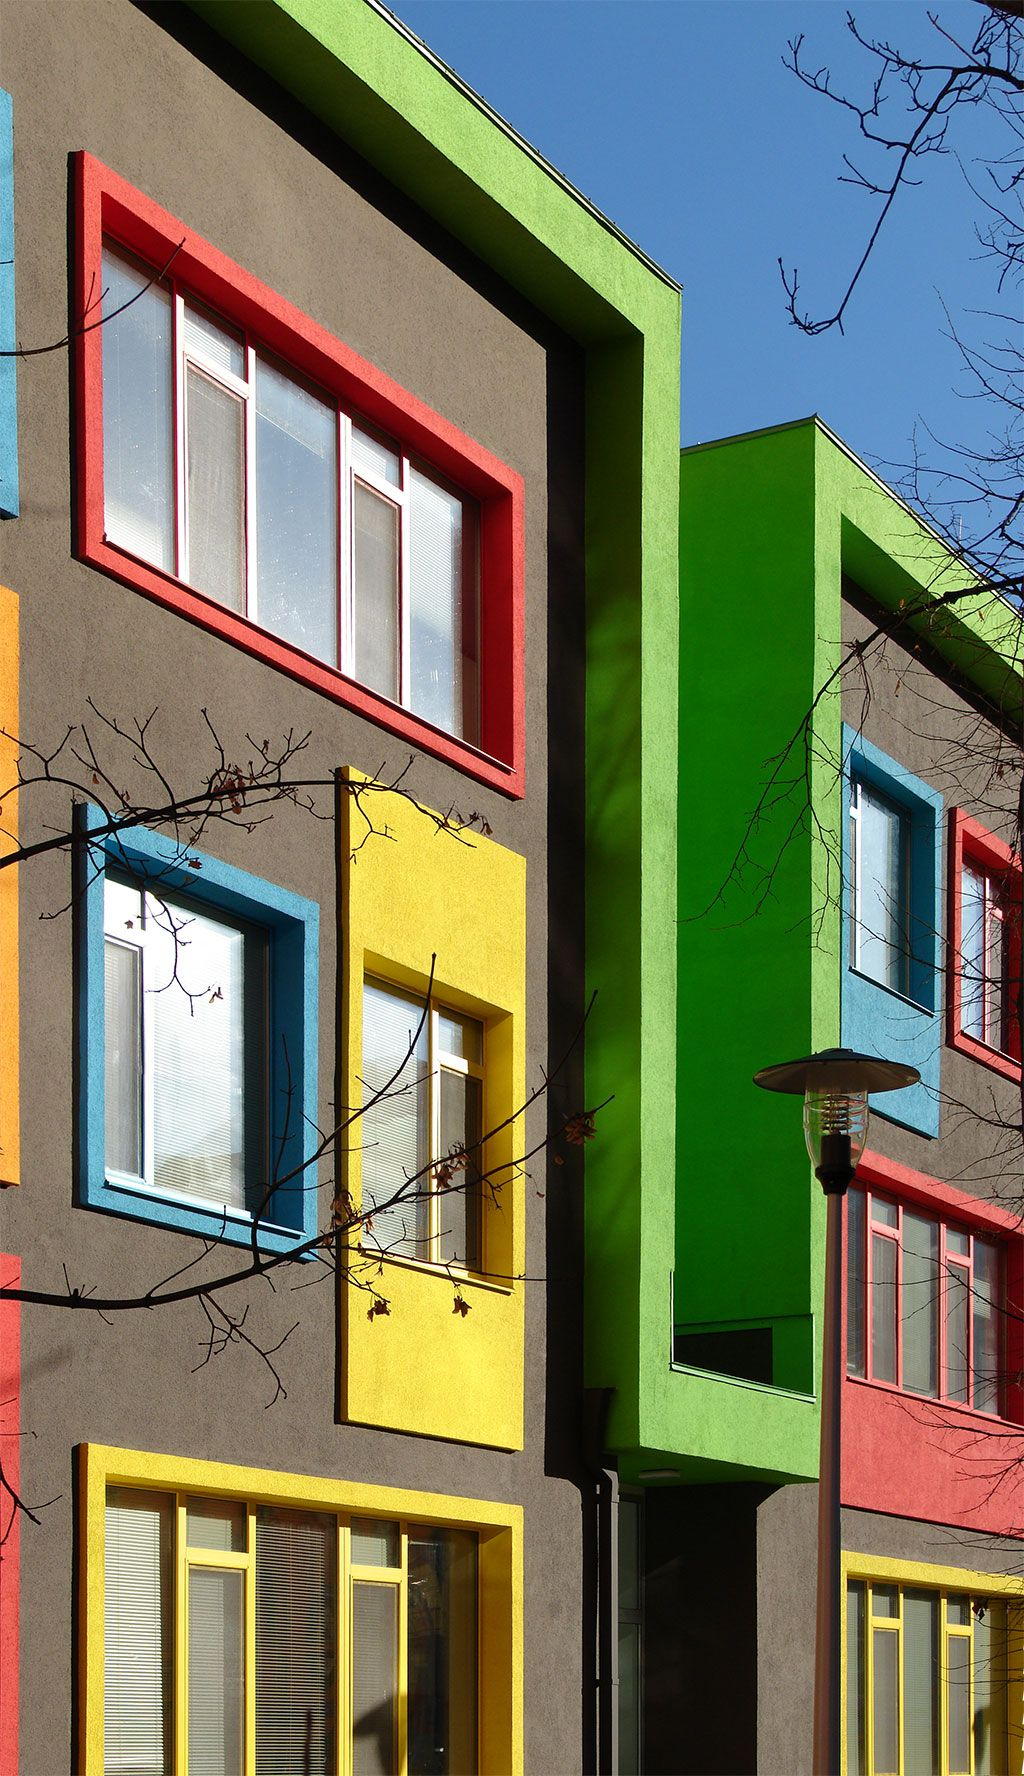 Comfort town kindergarten concept adaptation kyiv for Colorful concepts interior design